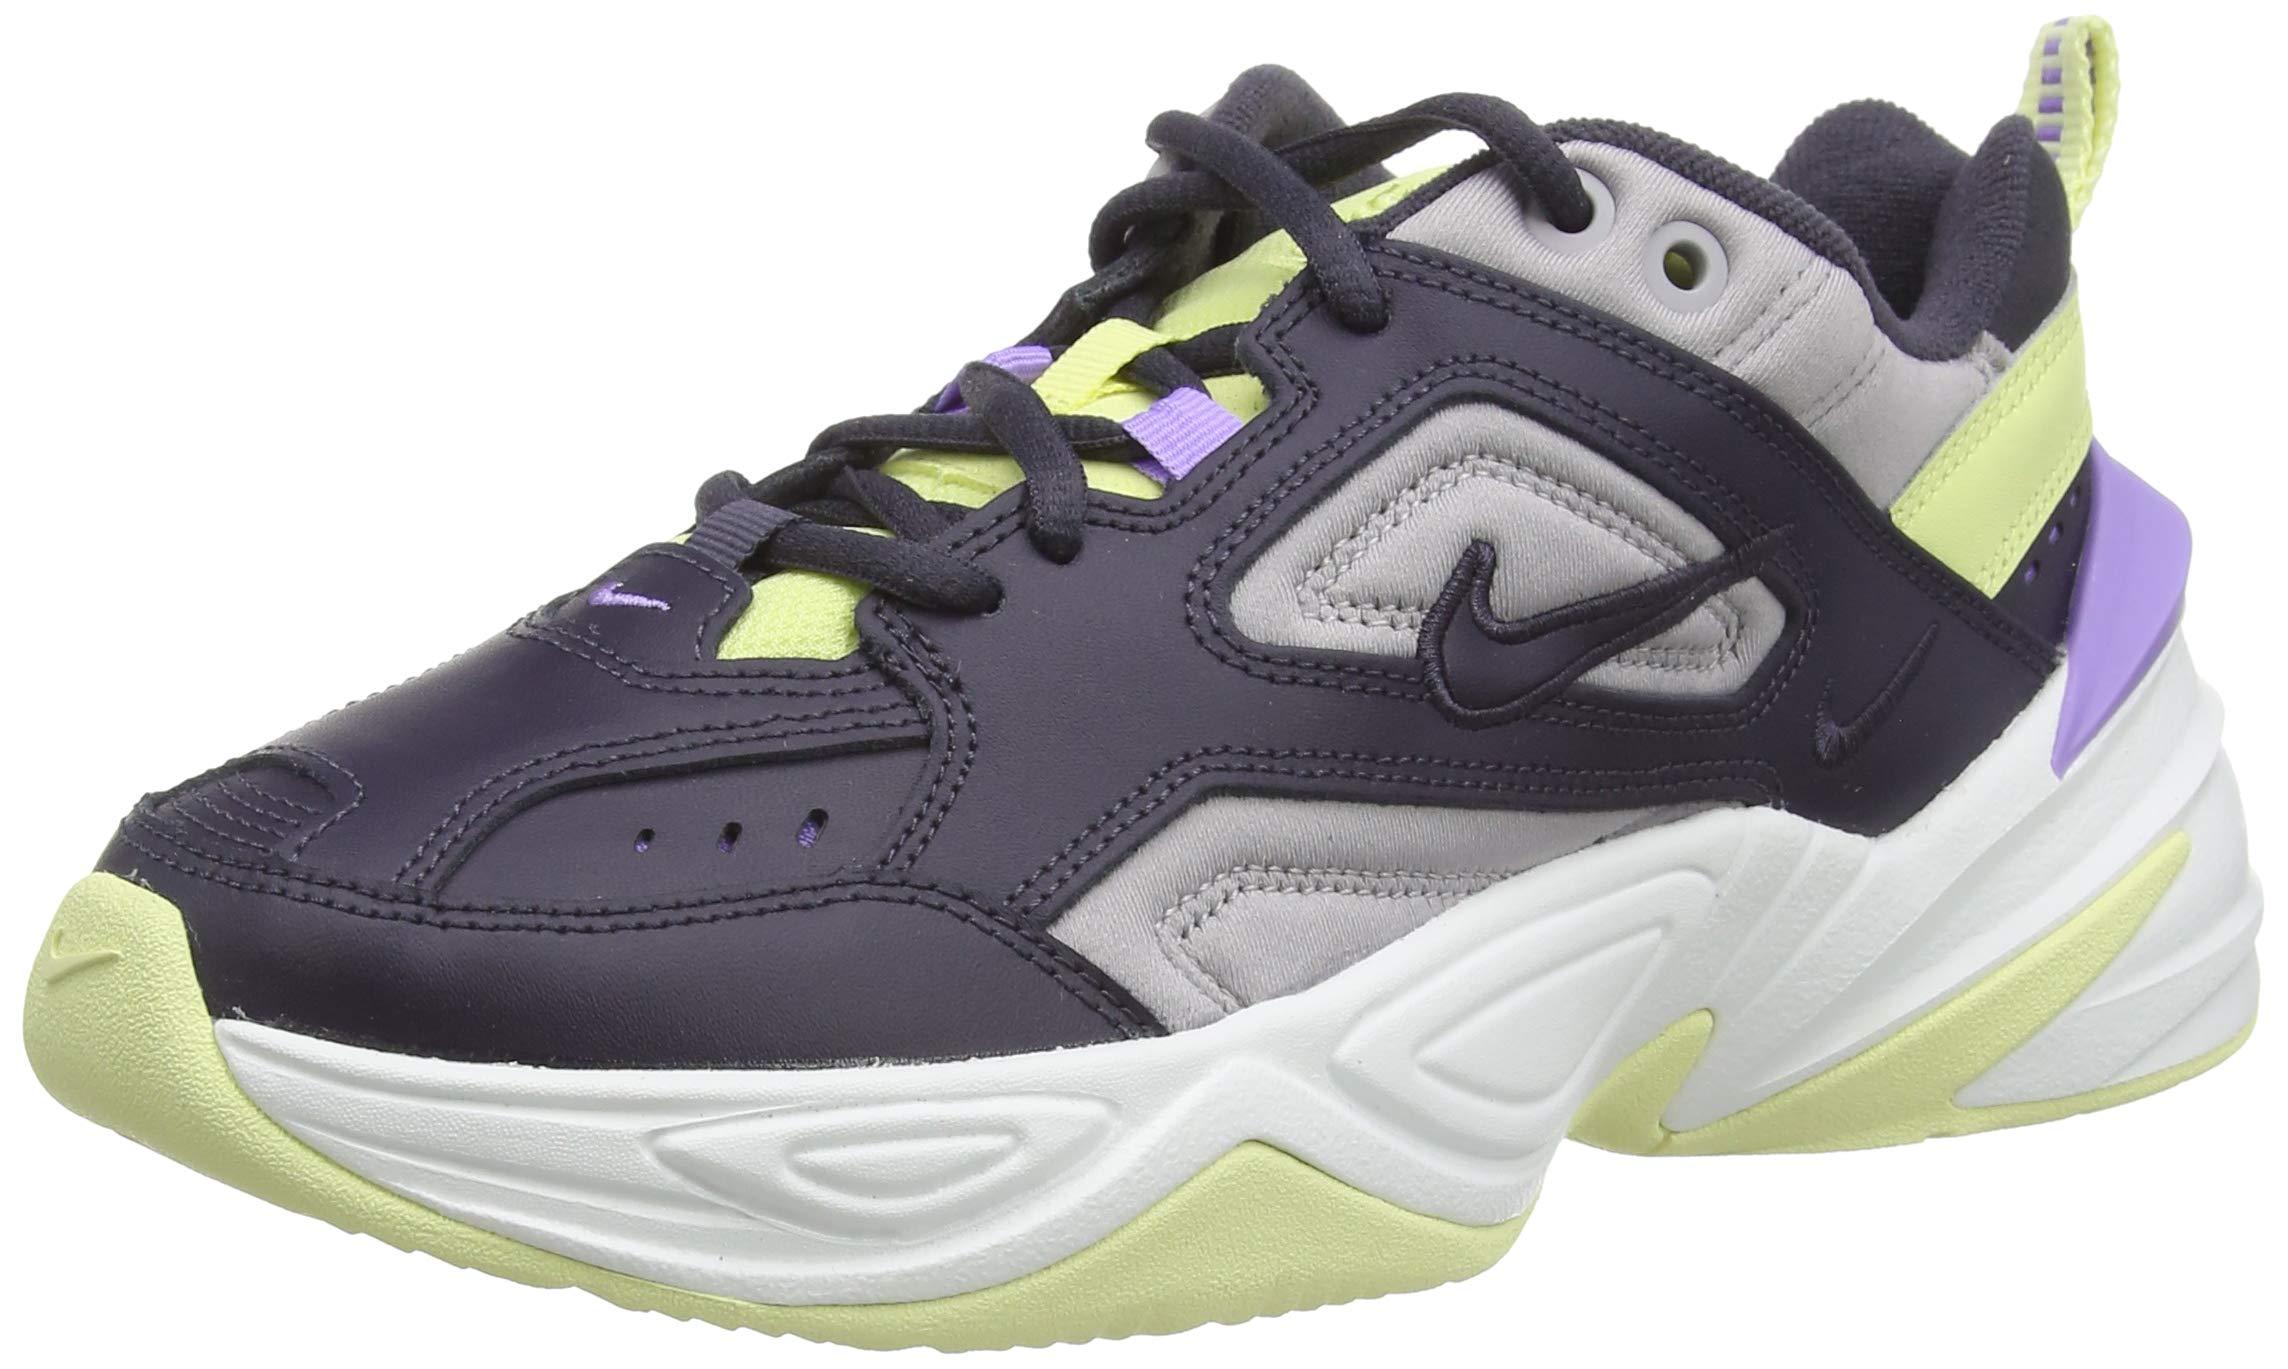 Nike Women's W M2k Tekno Gymnastics Shoes